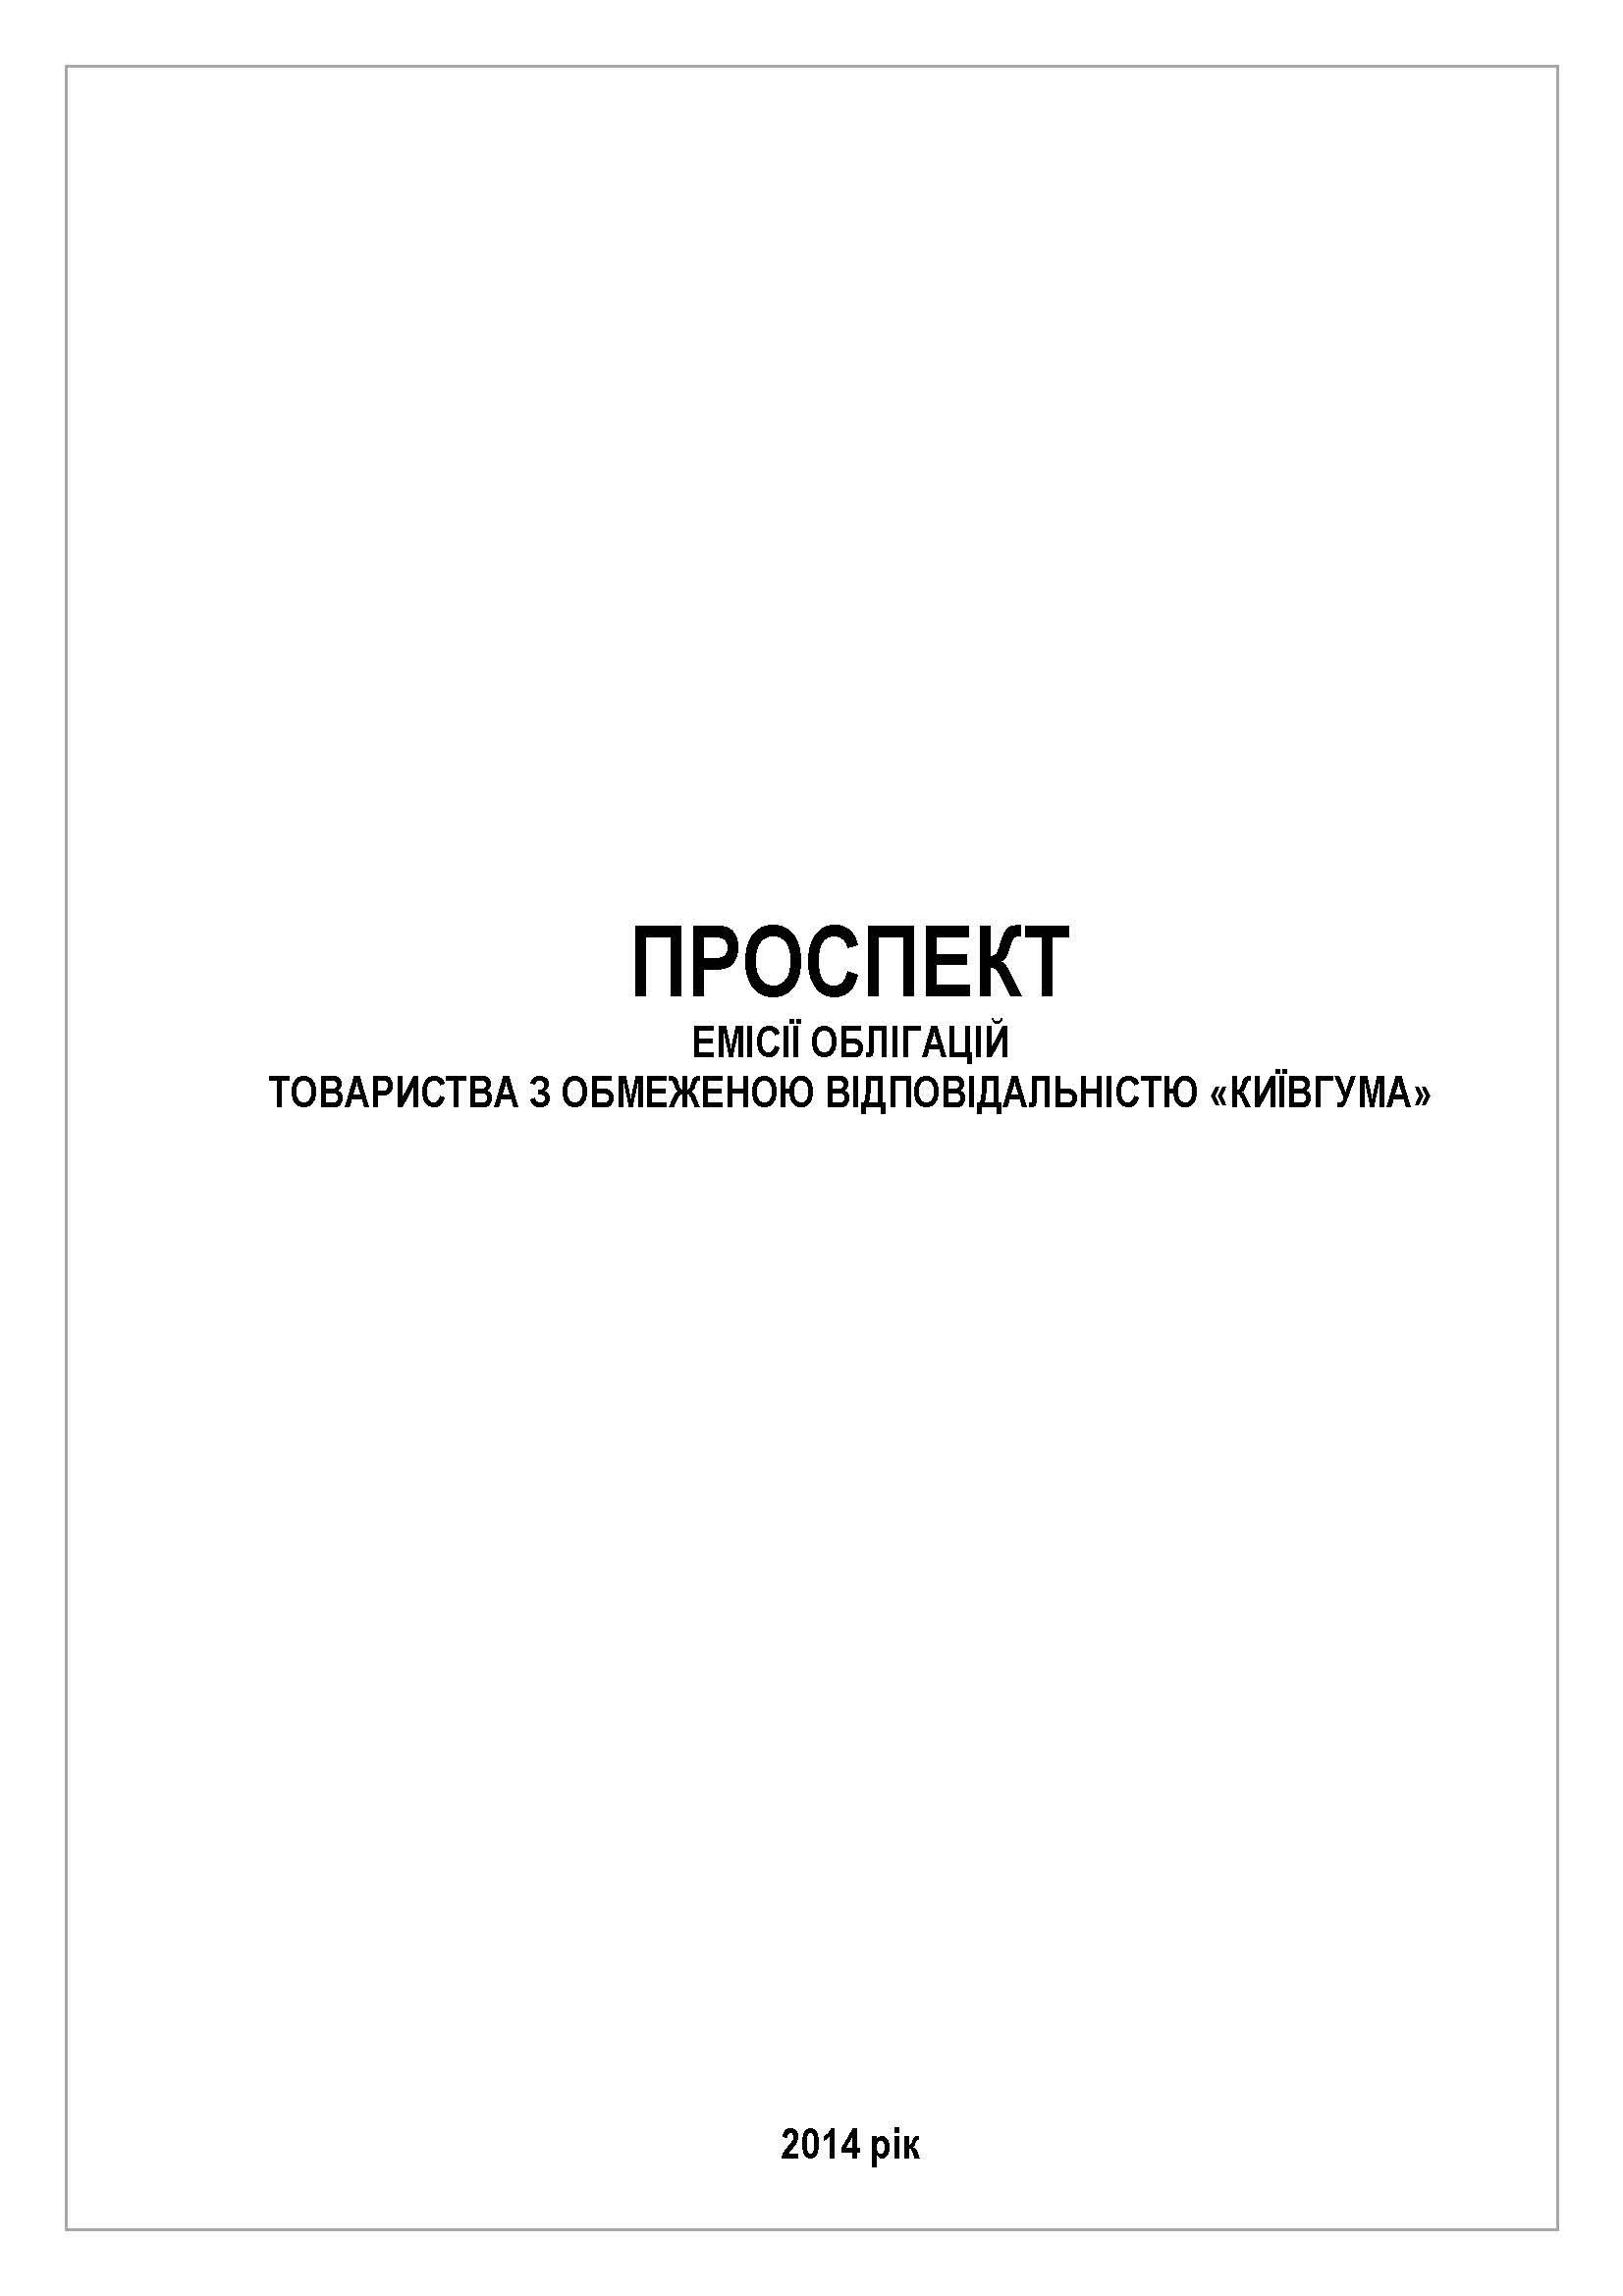 2014_ПРОСПЕКТ_ТОВ_КИЇВГУМА_Страница_01.jpg